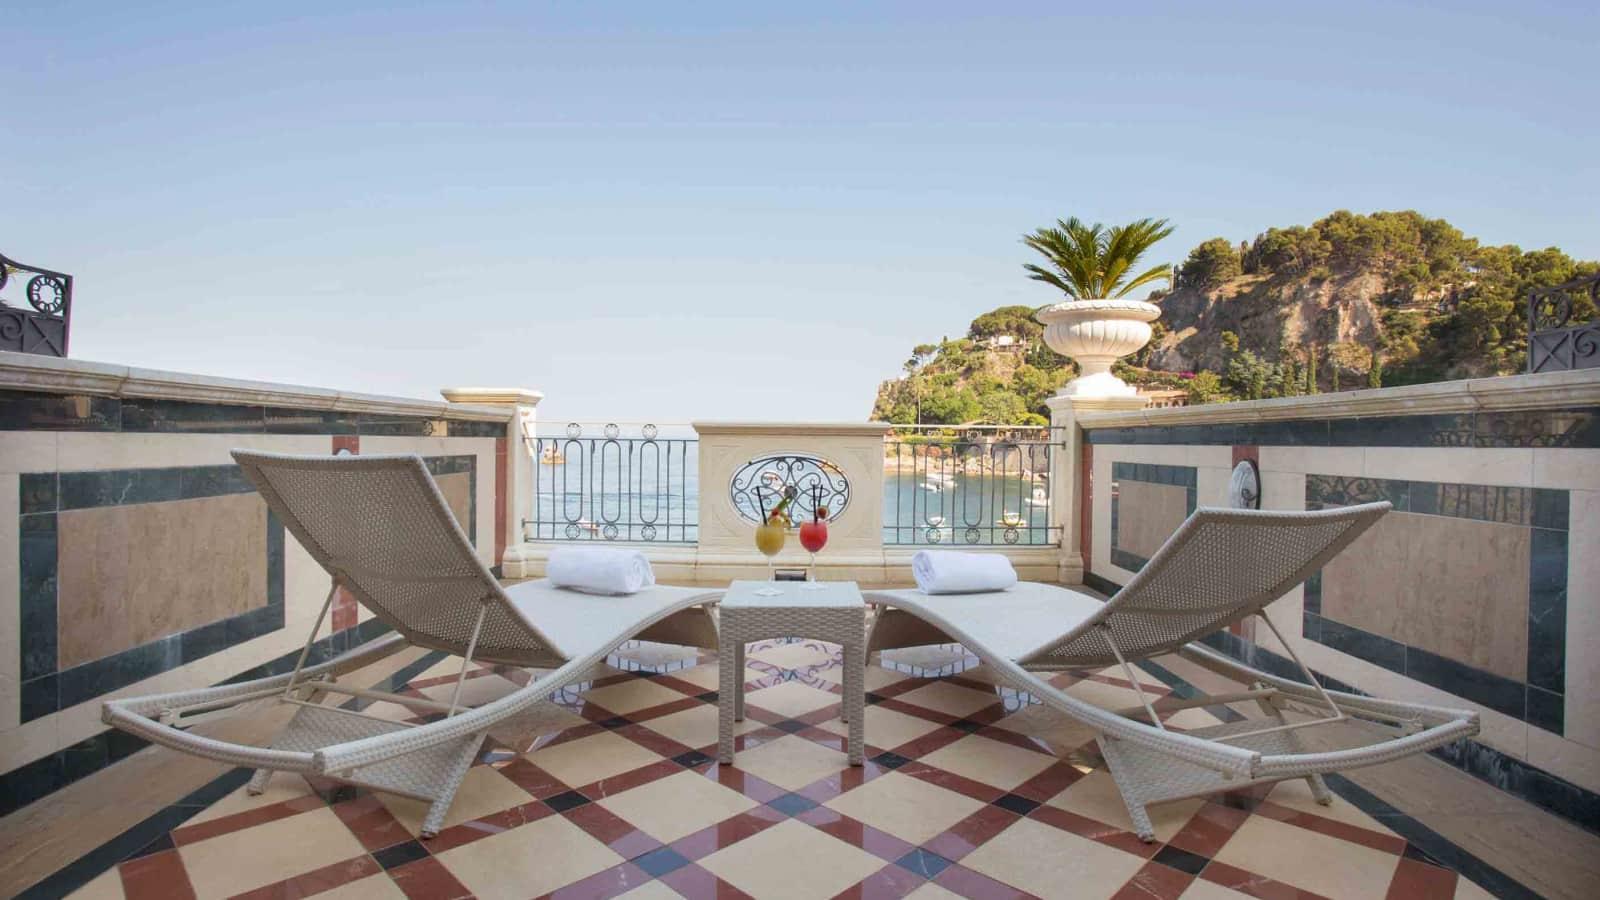 Grand Hotel Mazzaro Sea Palace Reviews